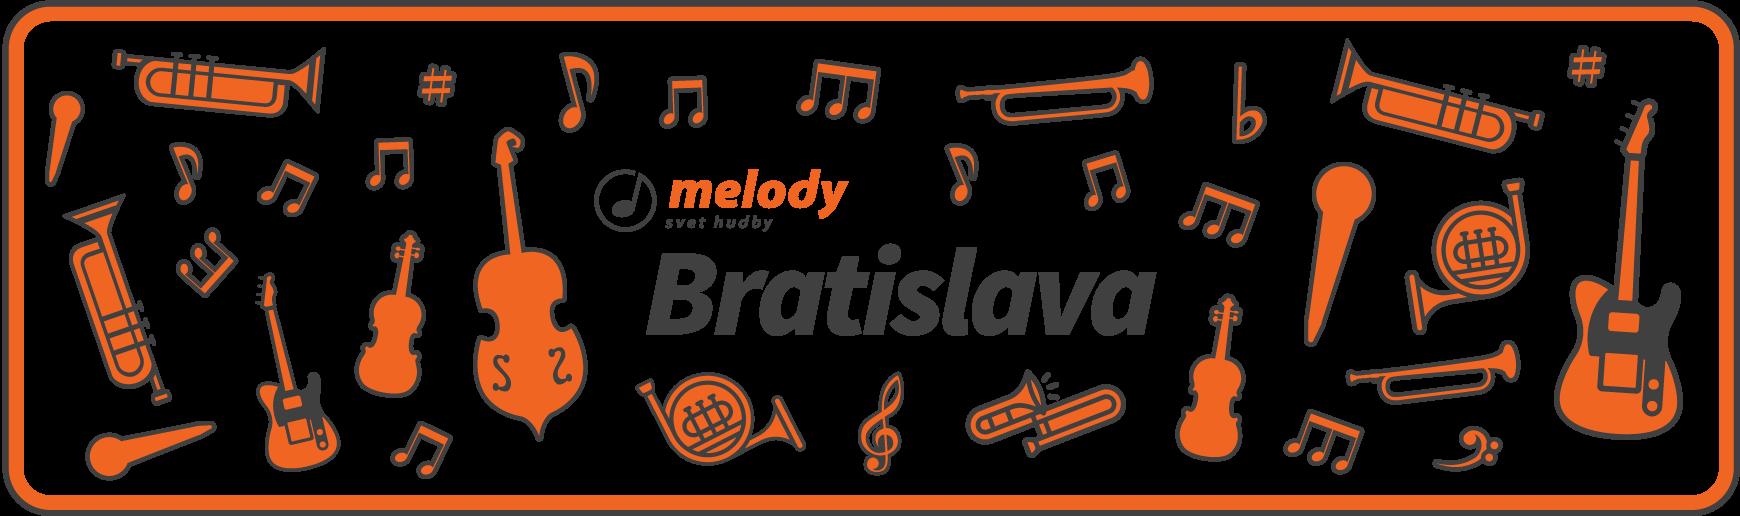 melody_bratislava